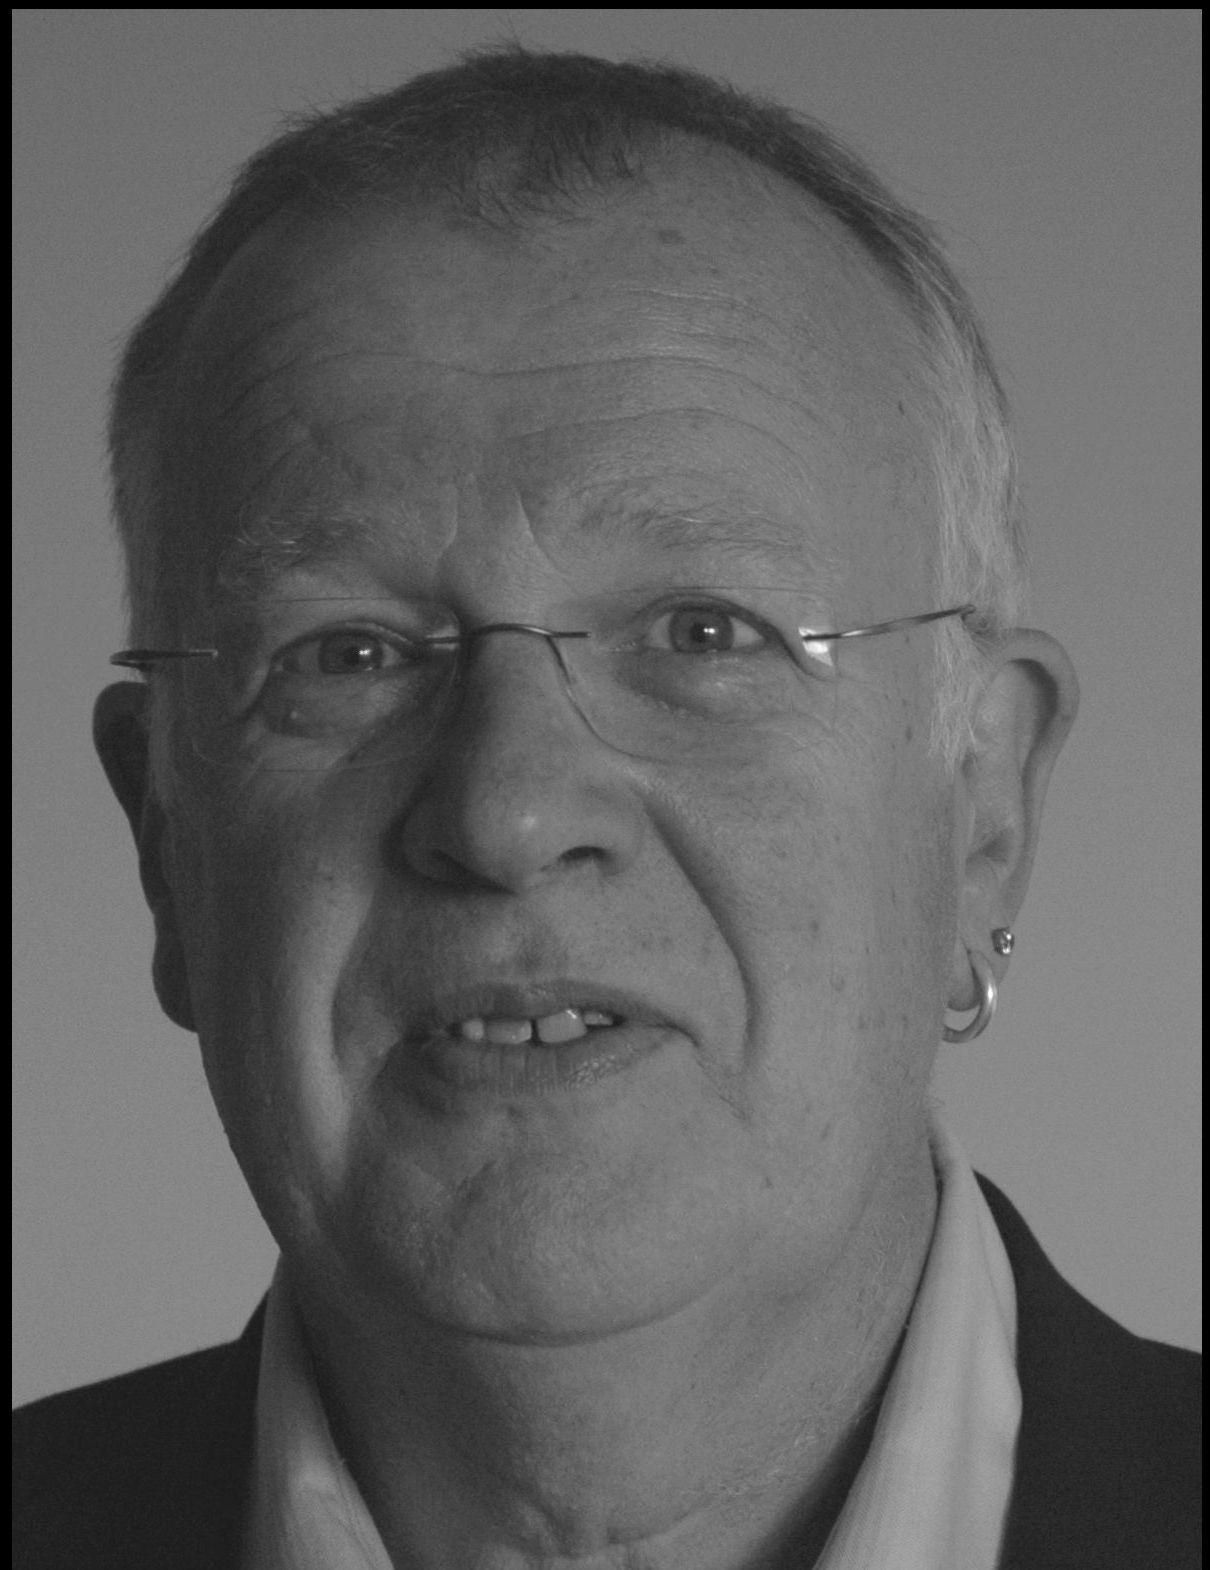 Dr Thomas Rohkramer